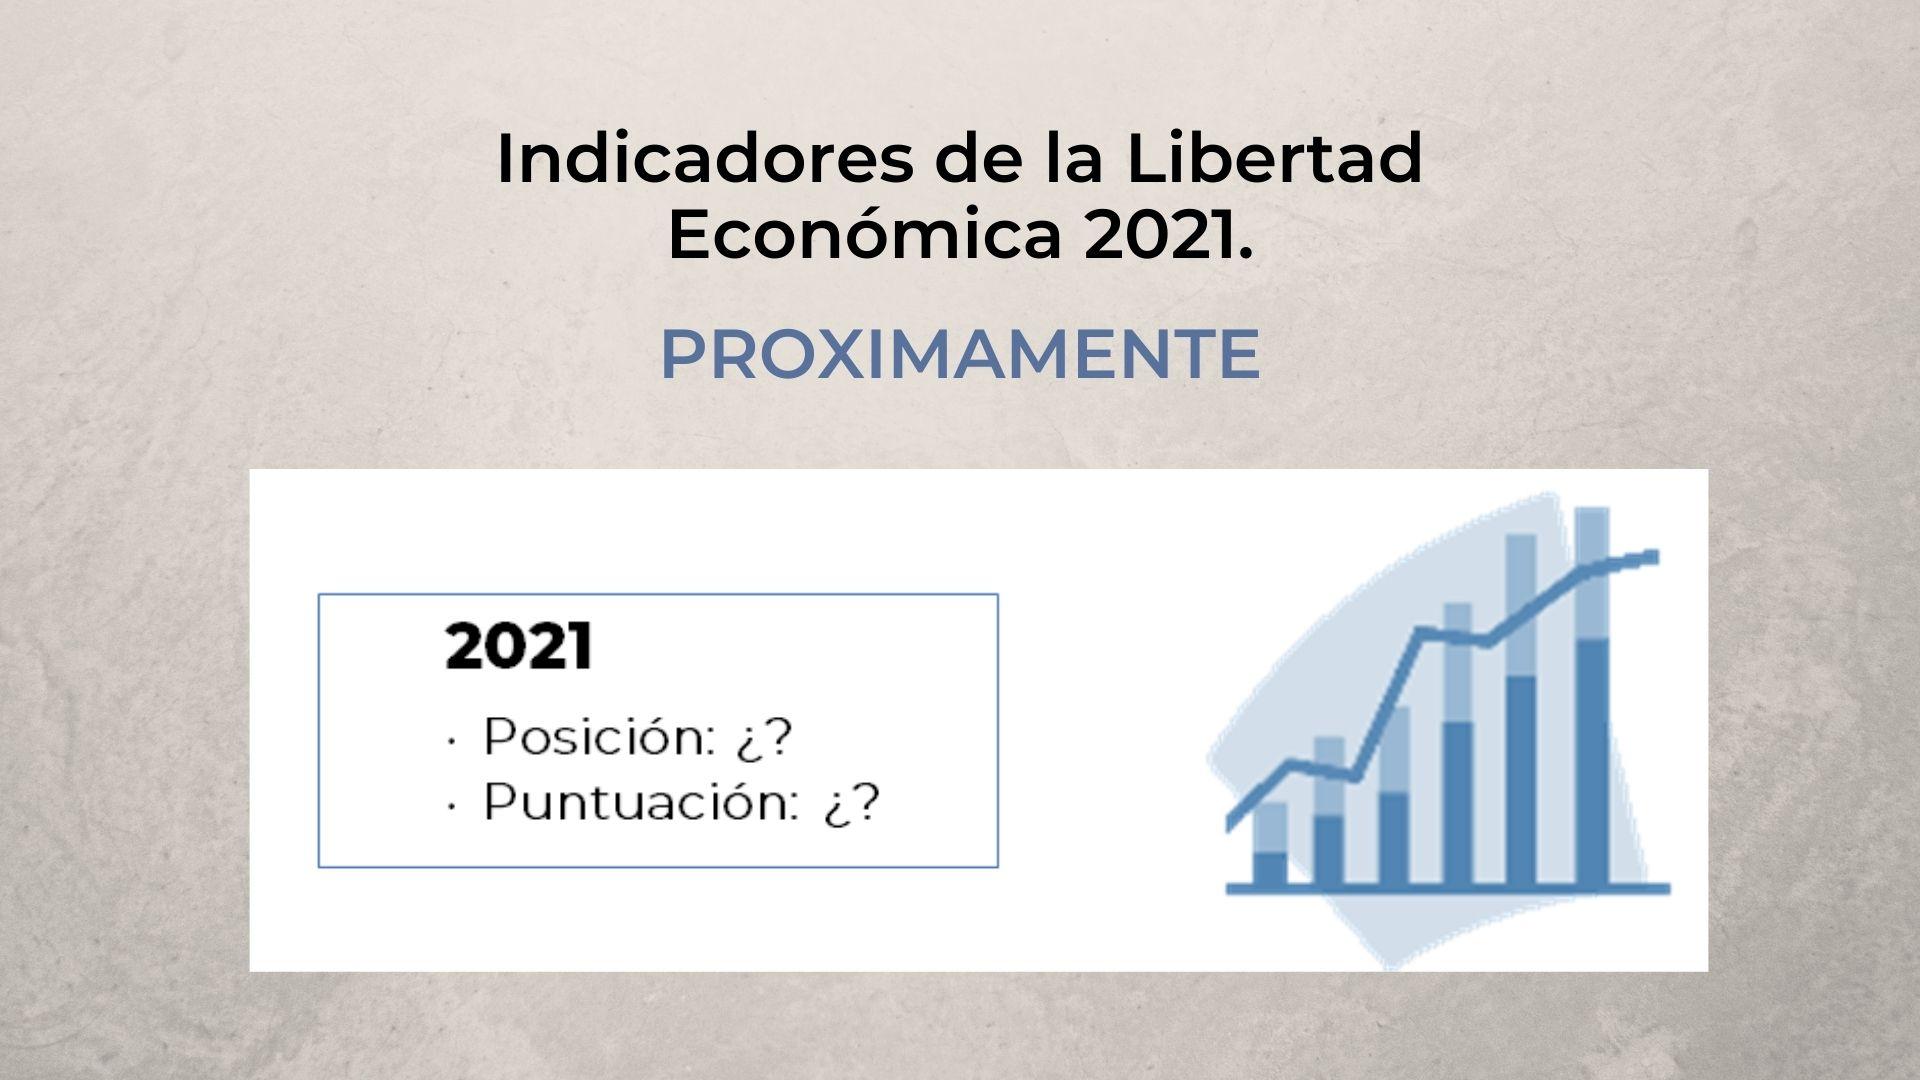 PROXIMAMENTE. Indicadores de la Libertad Económica 2021.